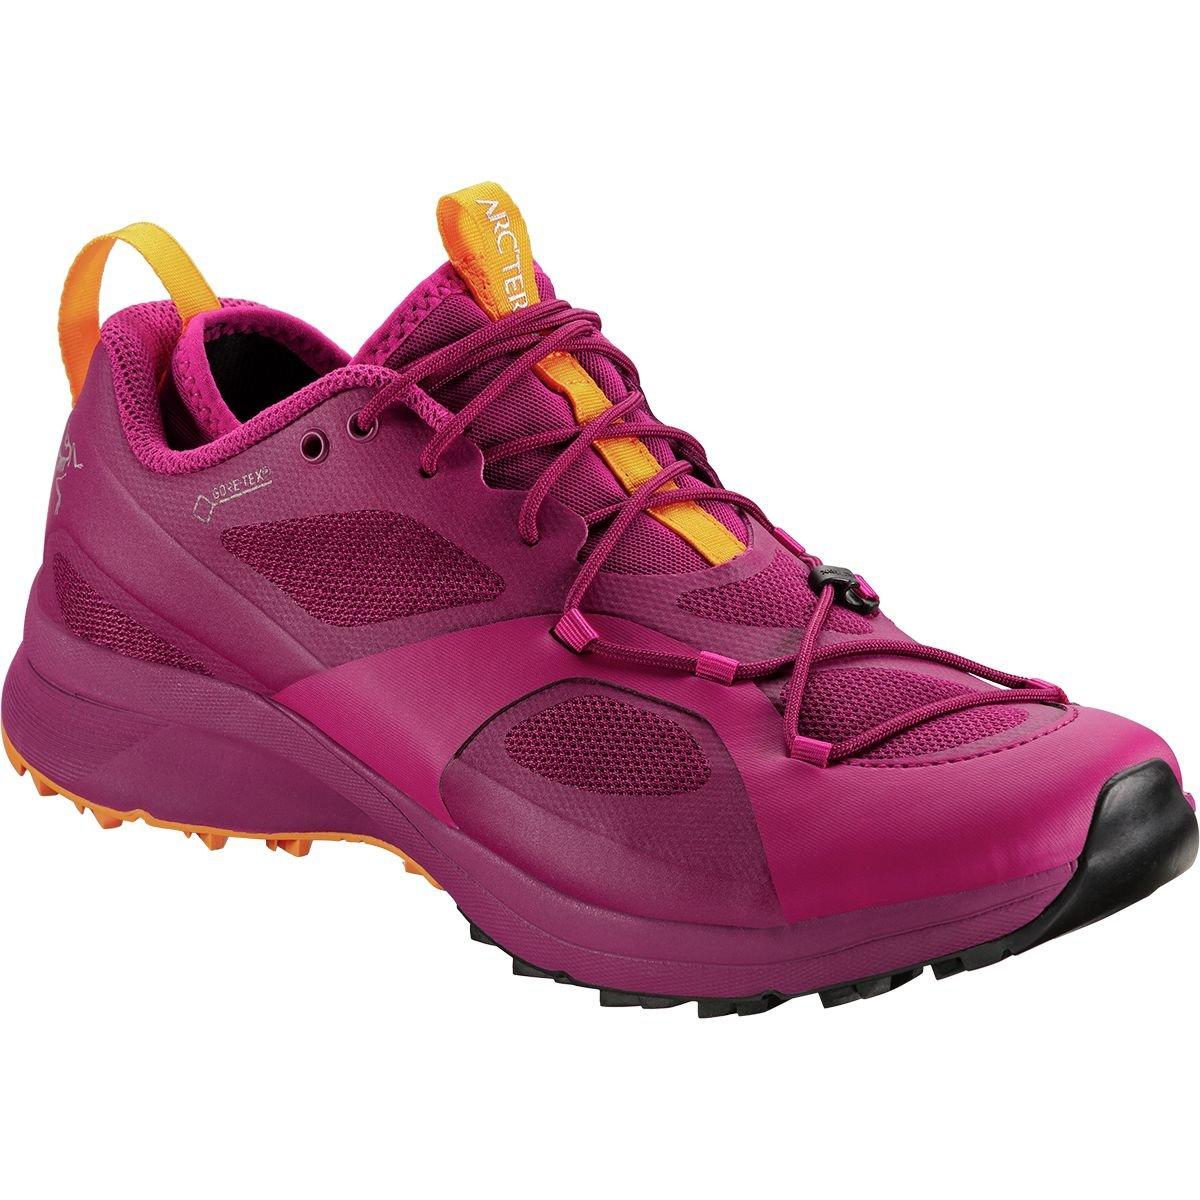 Arc'teryx Norvan VT GTX Trail Running Shoe - Women's B078NCN1BS US 7.5/UK 6.0|Liberty/Arcturus